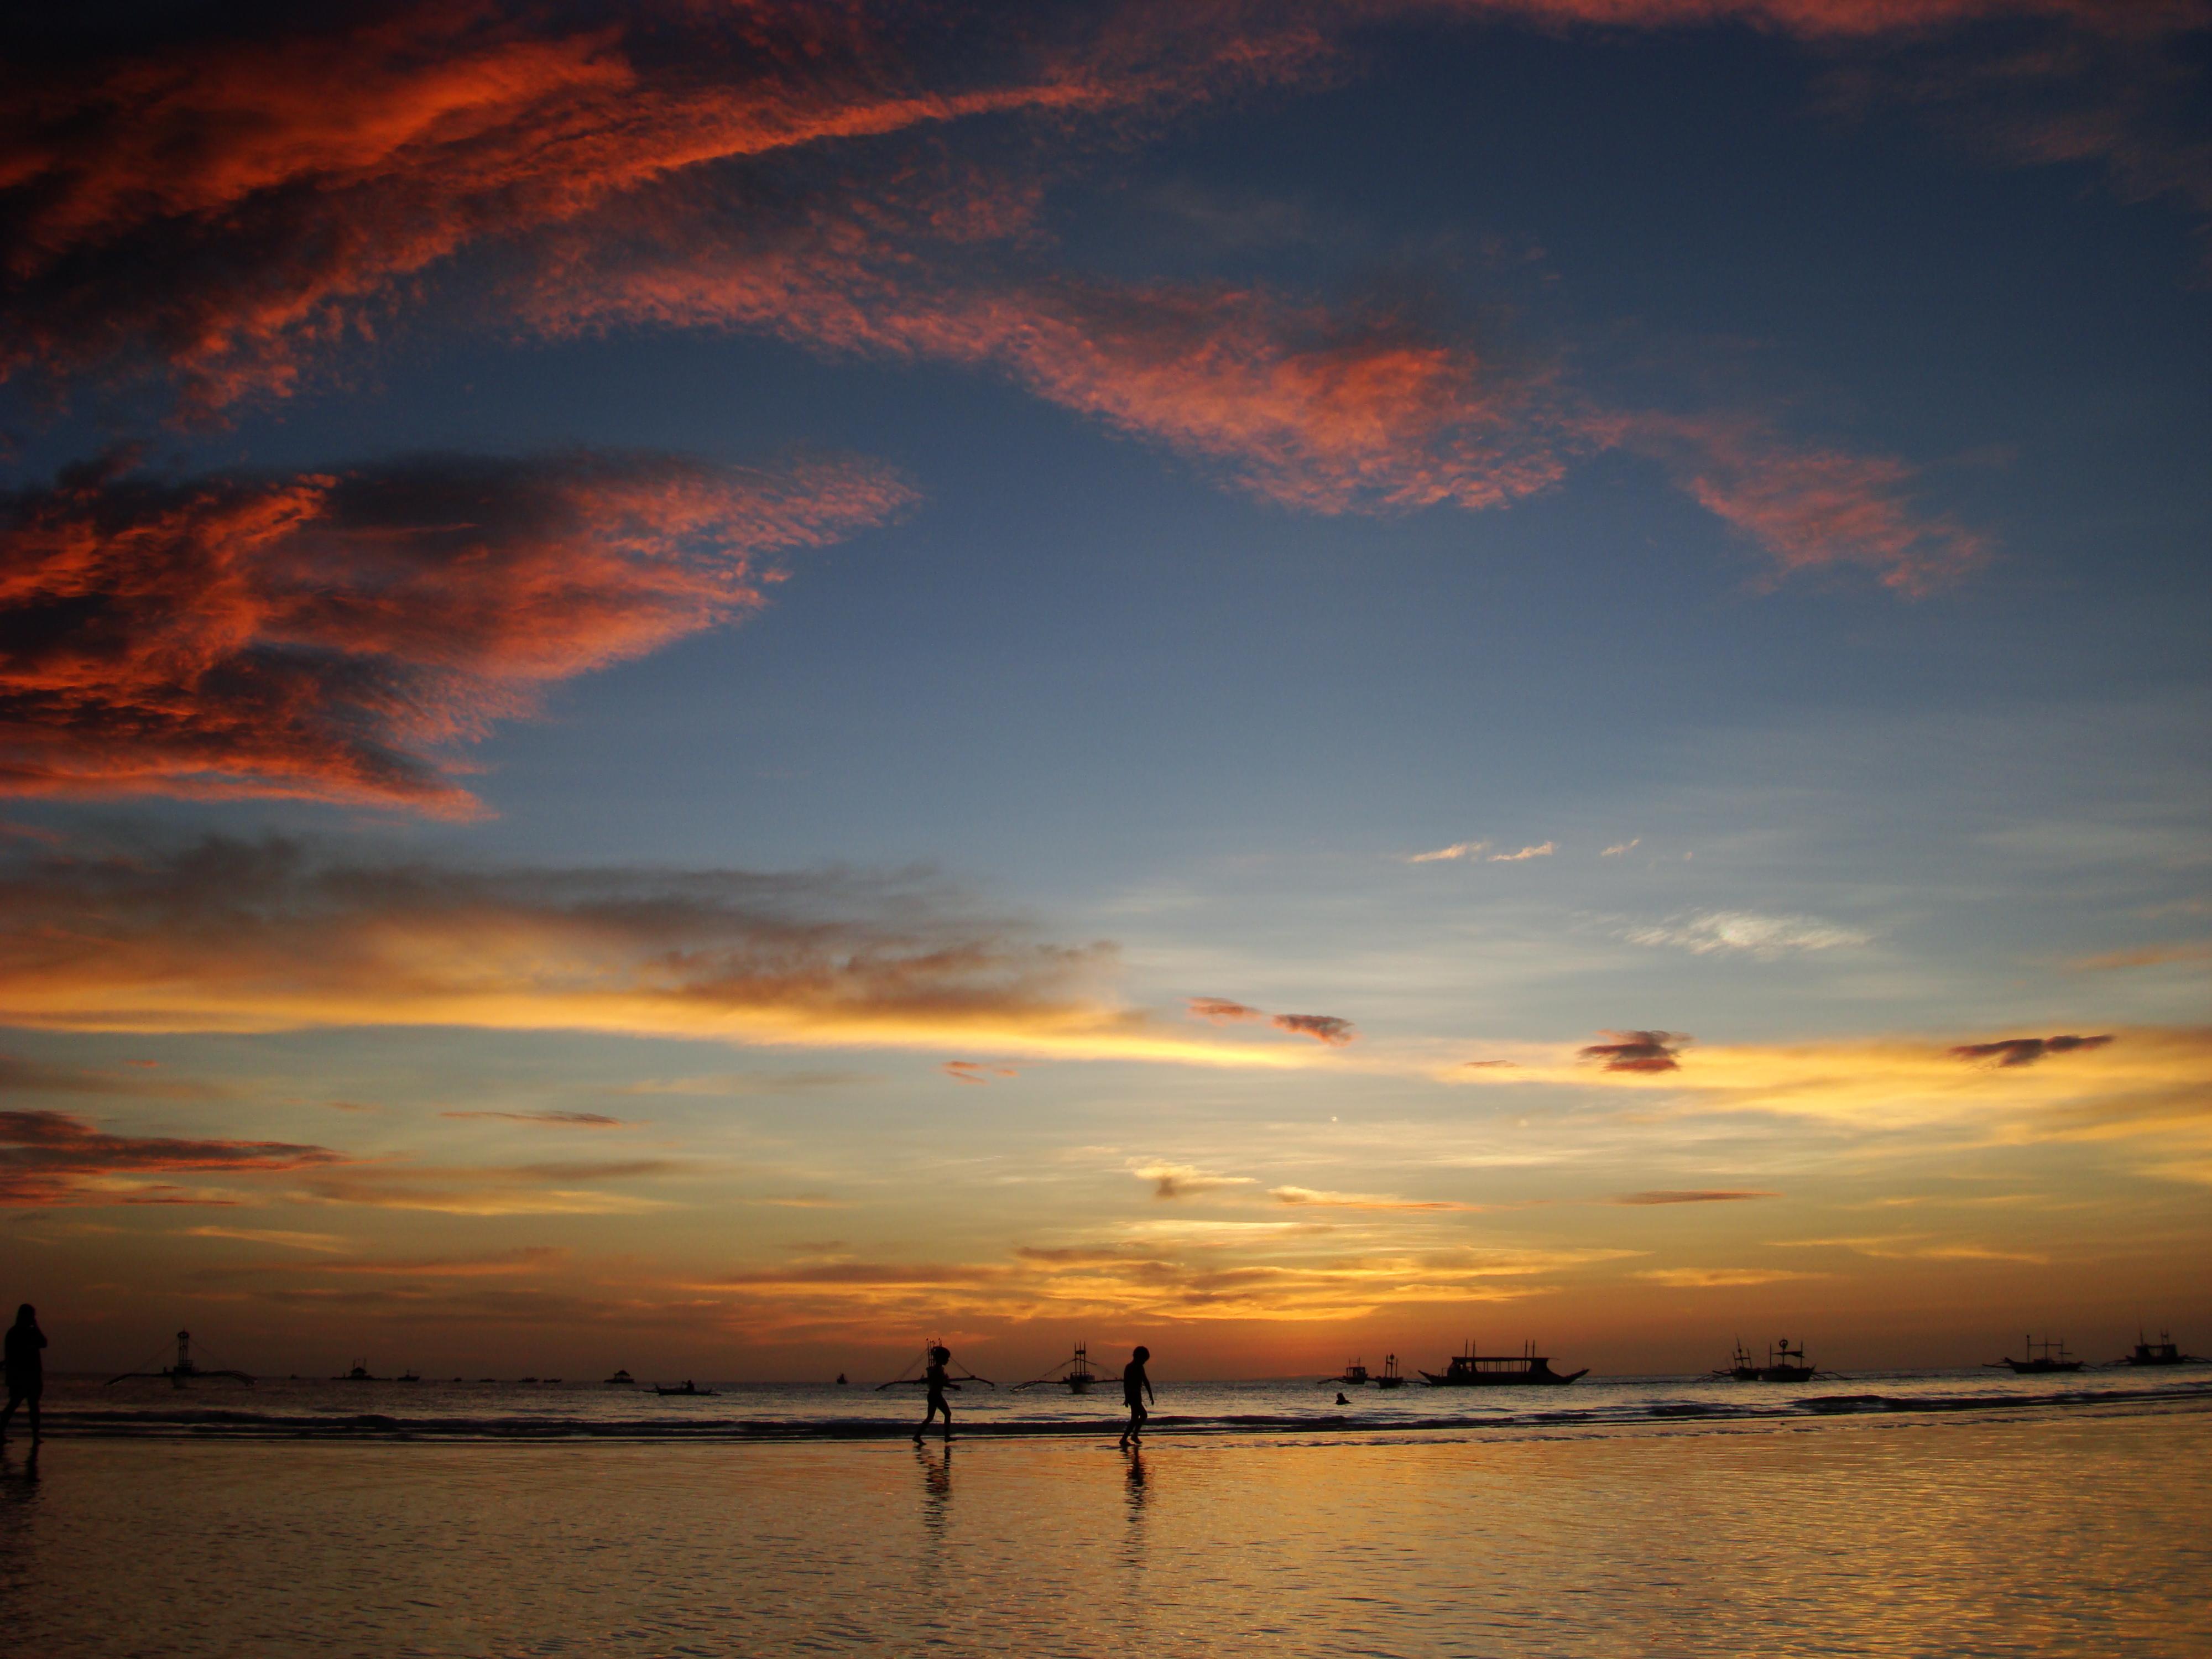 Sunset Philippines Boracay Beach 14